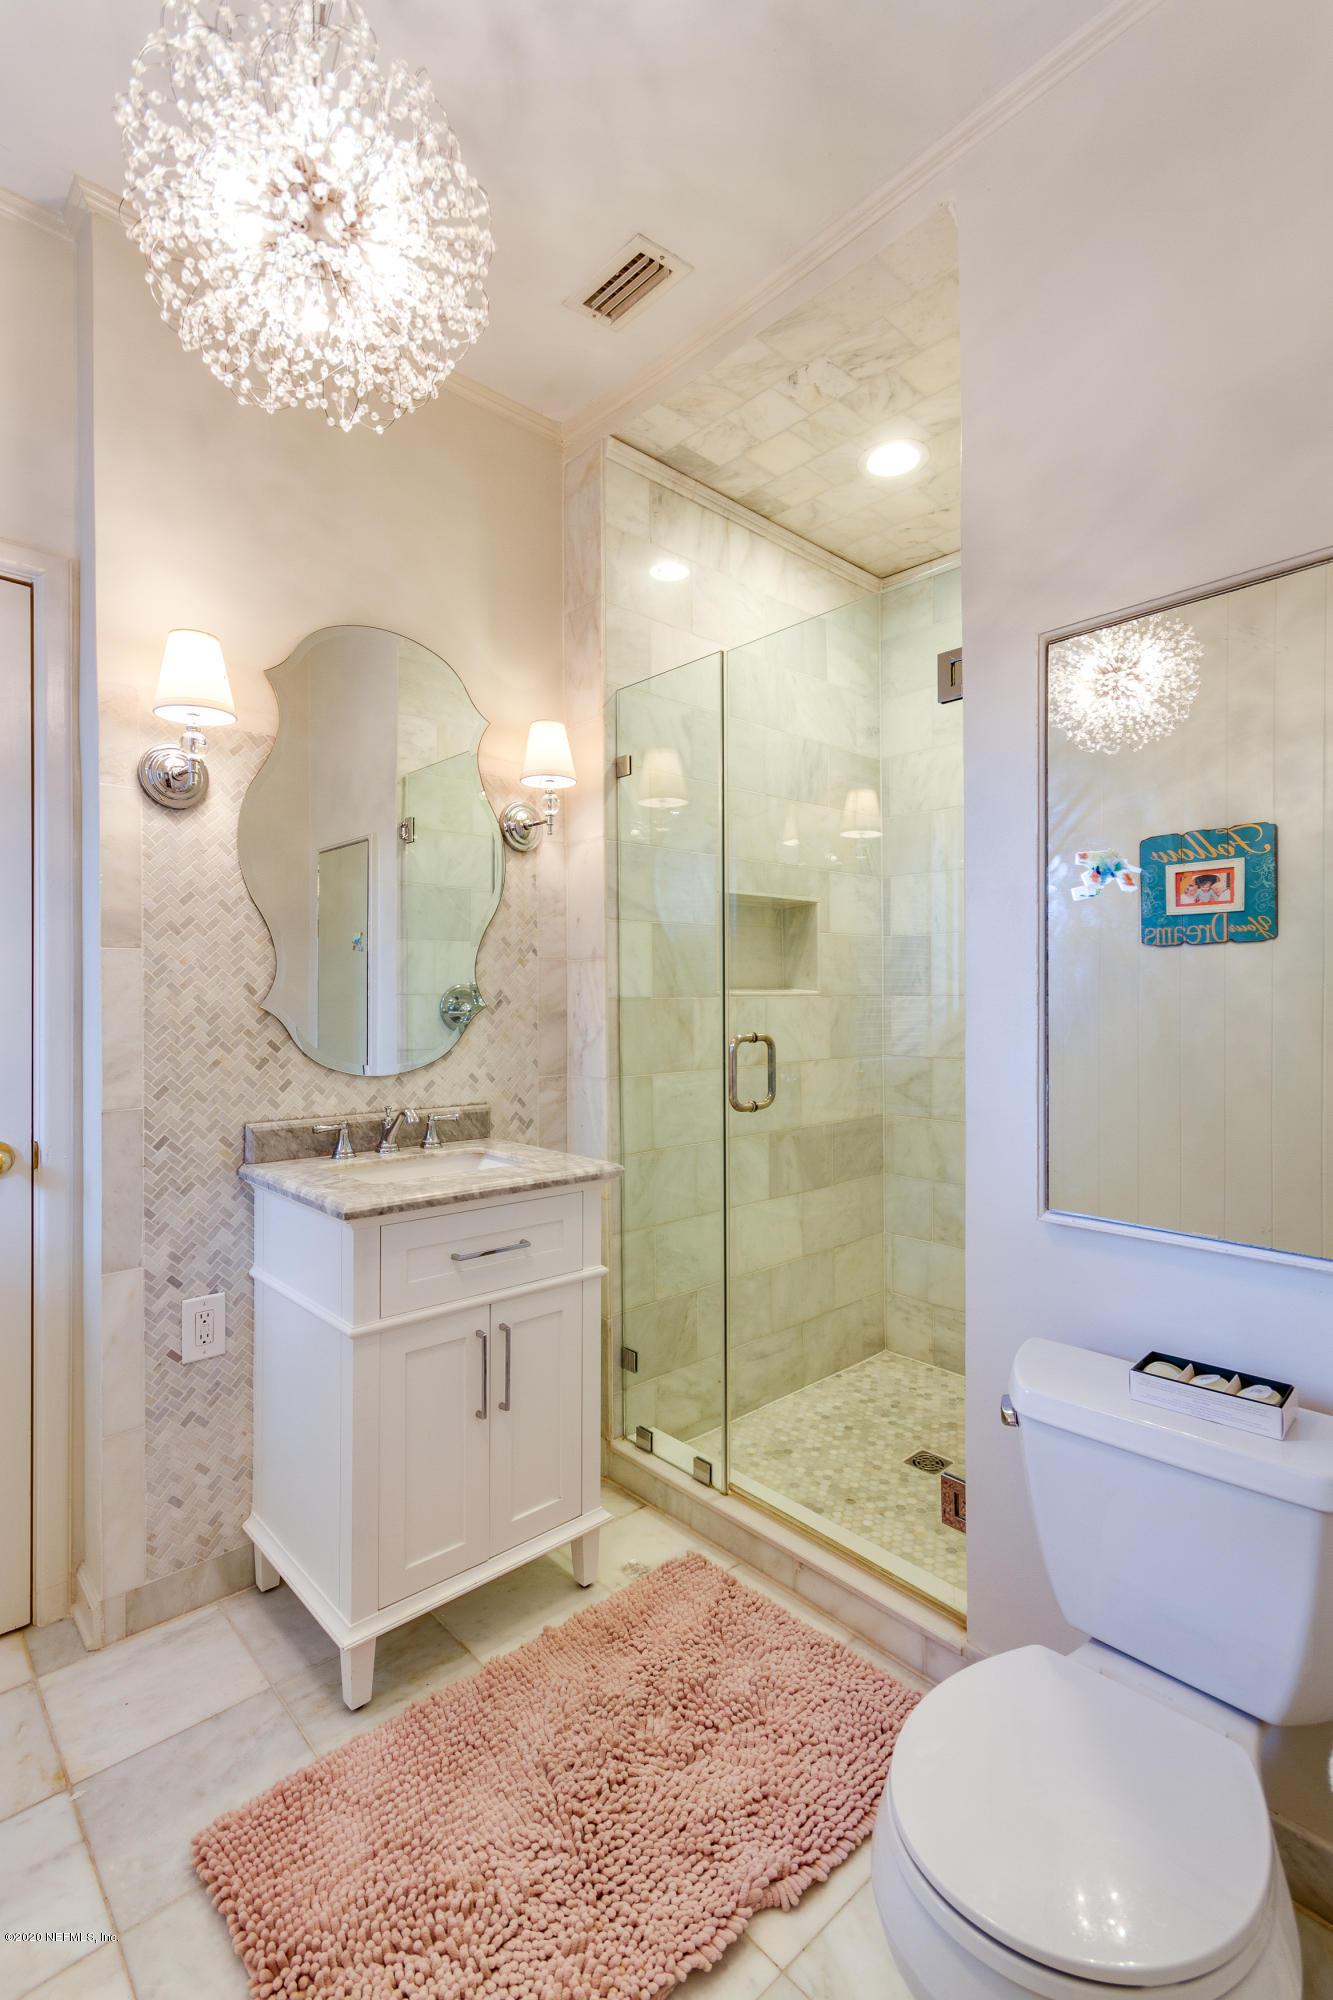 943 BROOKWOOD, JACKSONVILLE, FLORIDA 32207, 4 Bedrooms Bedrooms, ,4 BathroomsBathrooms,Residential,For sale,BROOKWOOD,1056499